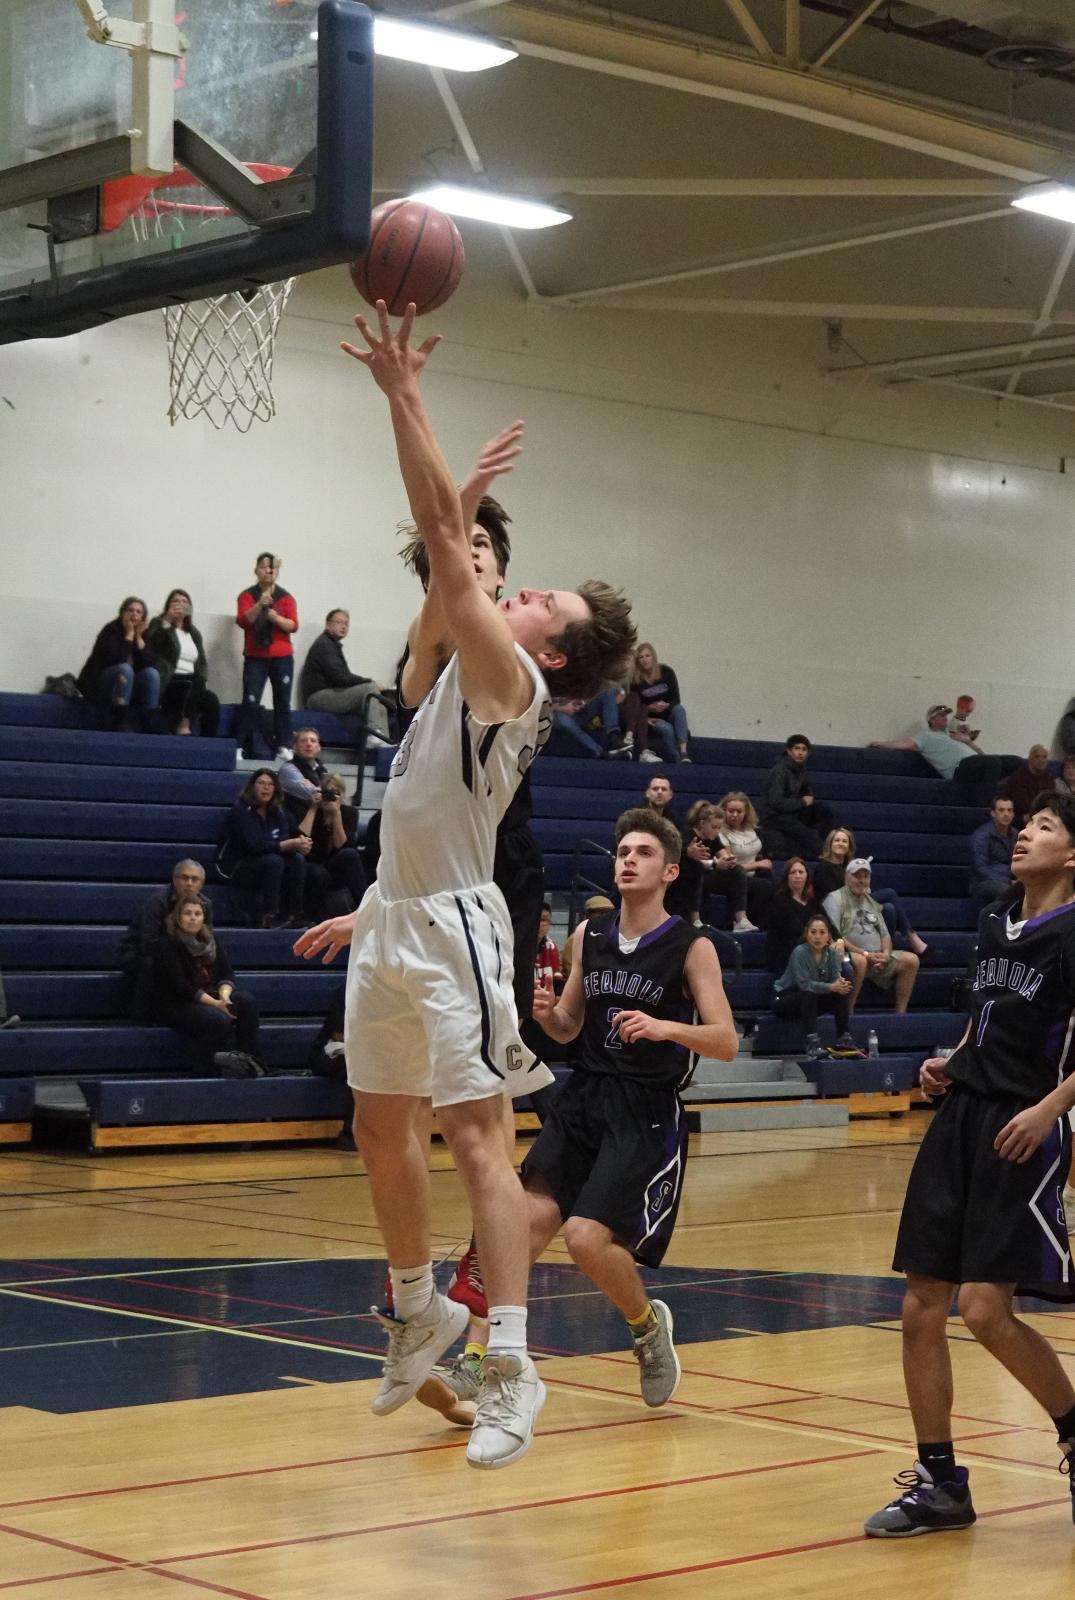 2019-20 Basketball-Boys-JV vs.Sequoia 63-32